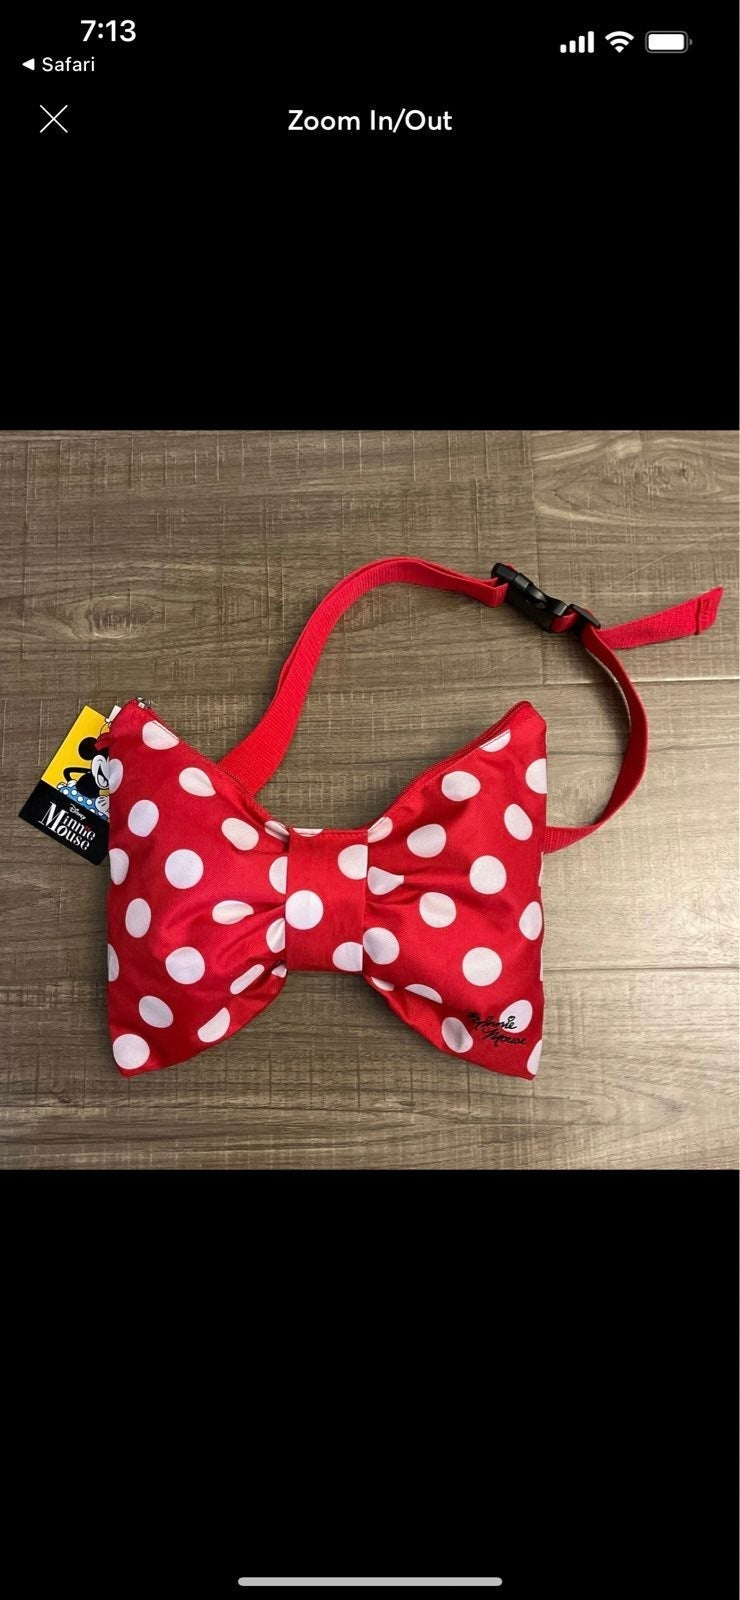 Disney Minnie Mouse waist bag Fanny pack